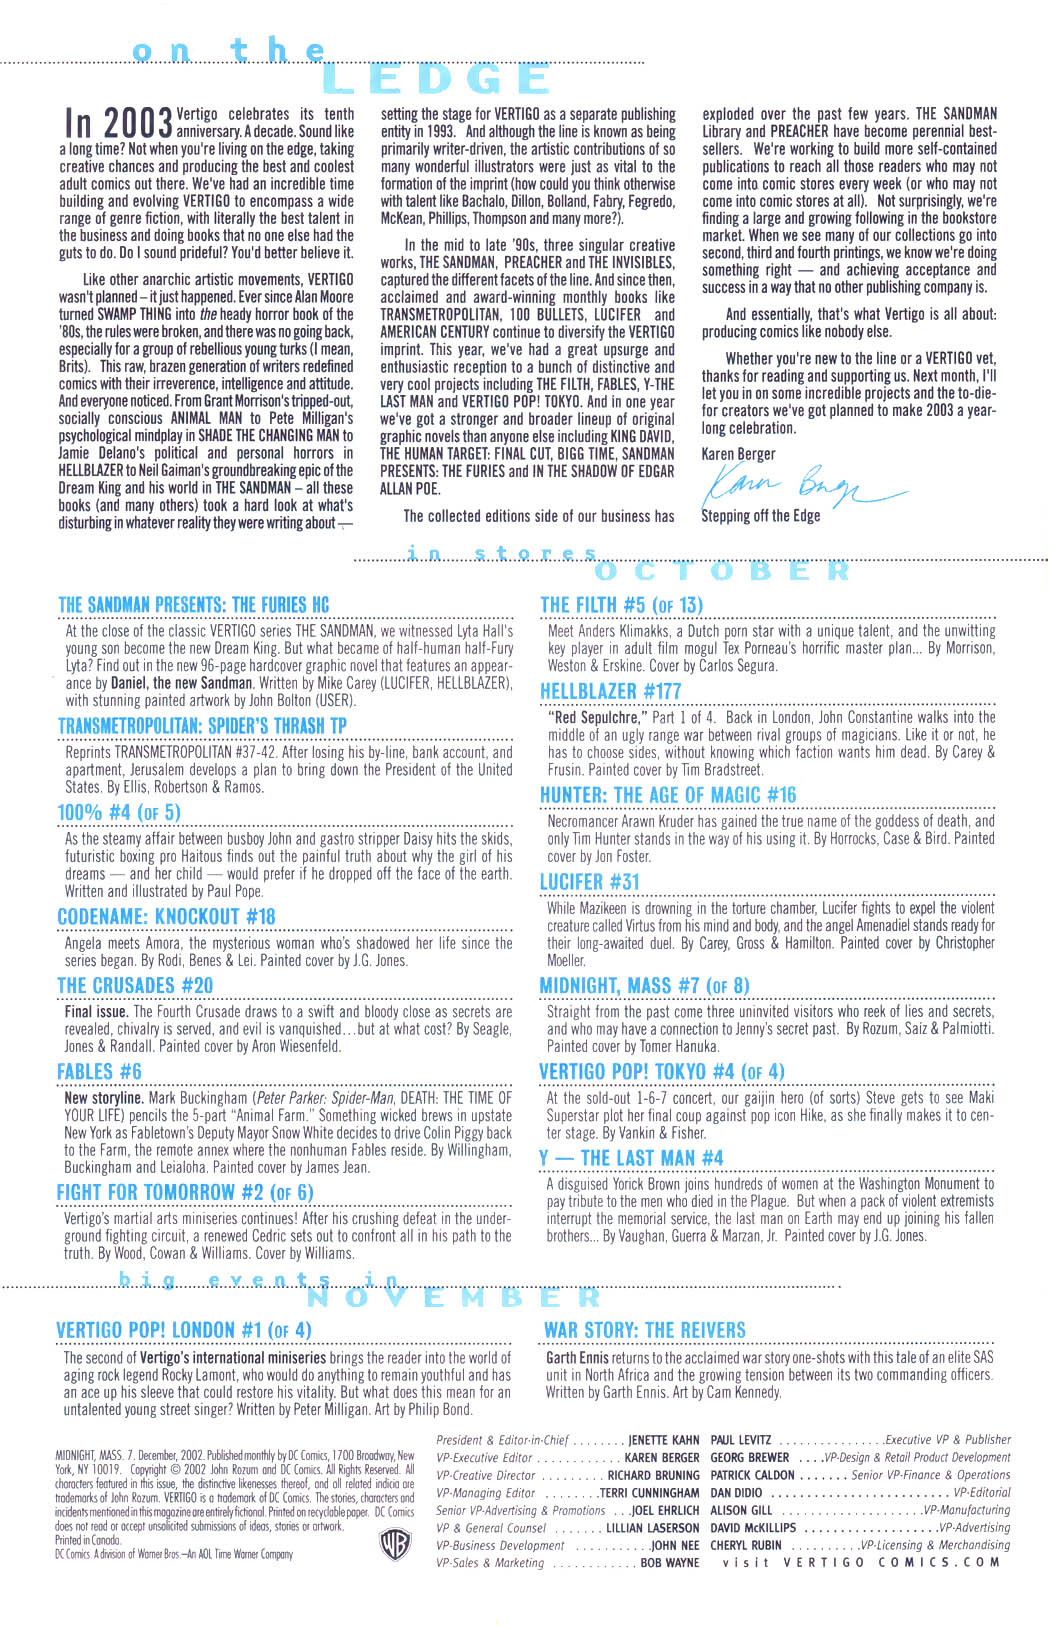 Read online Midnight, Mass comic -  Issue #7 - 22